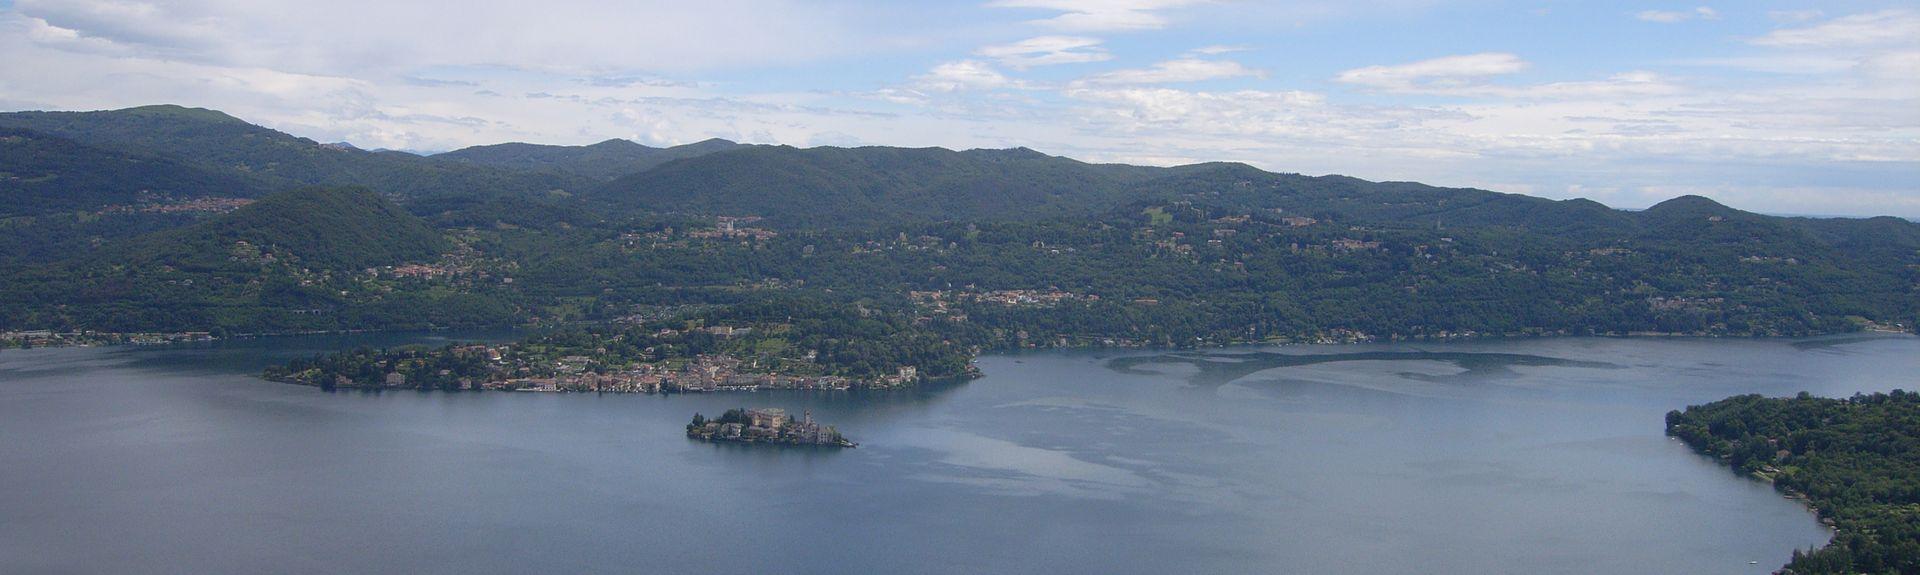 Valduggia, Piedmont, Italy